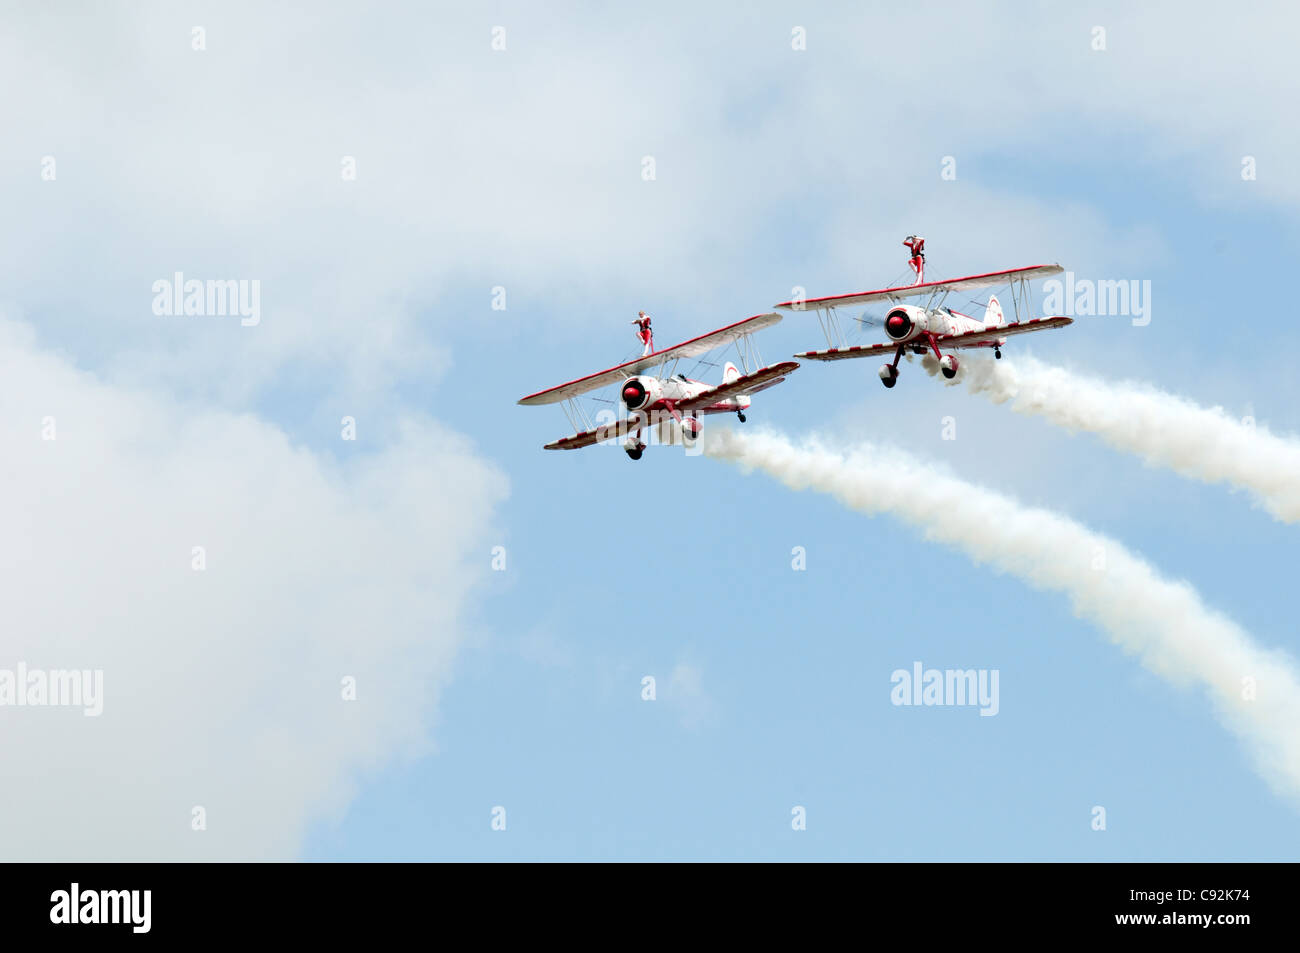 AeroSuperBatics Ltd based at RFC Rendcomb Aerodrome doing a flying display at Royal International Air Tattoo RAF - Stock Image